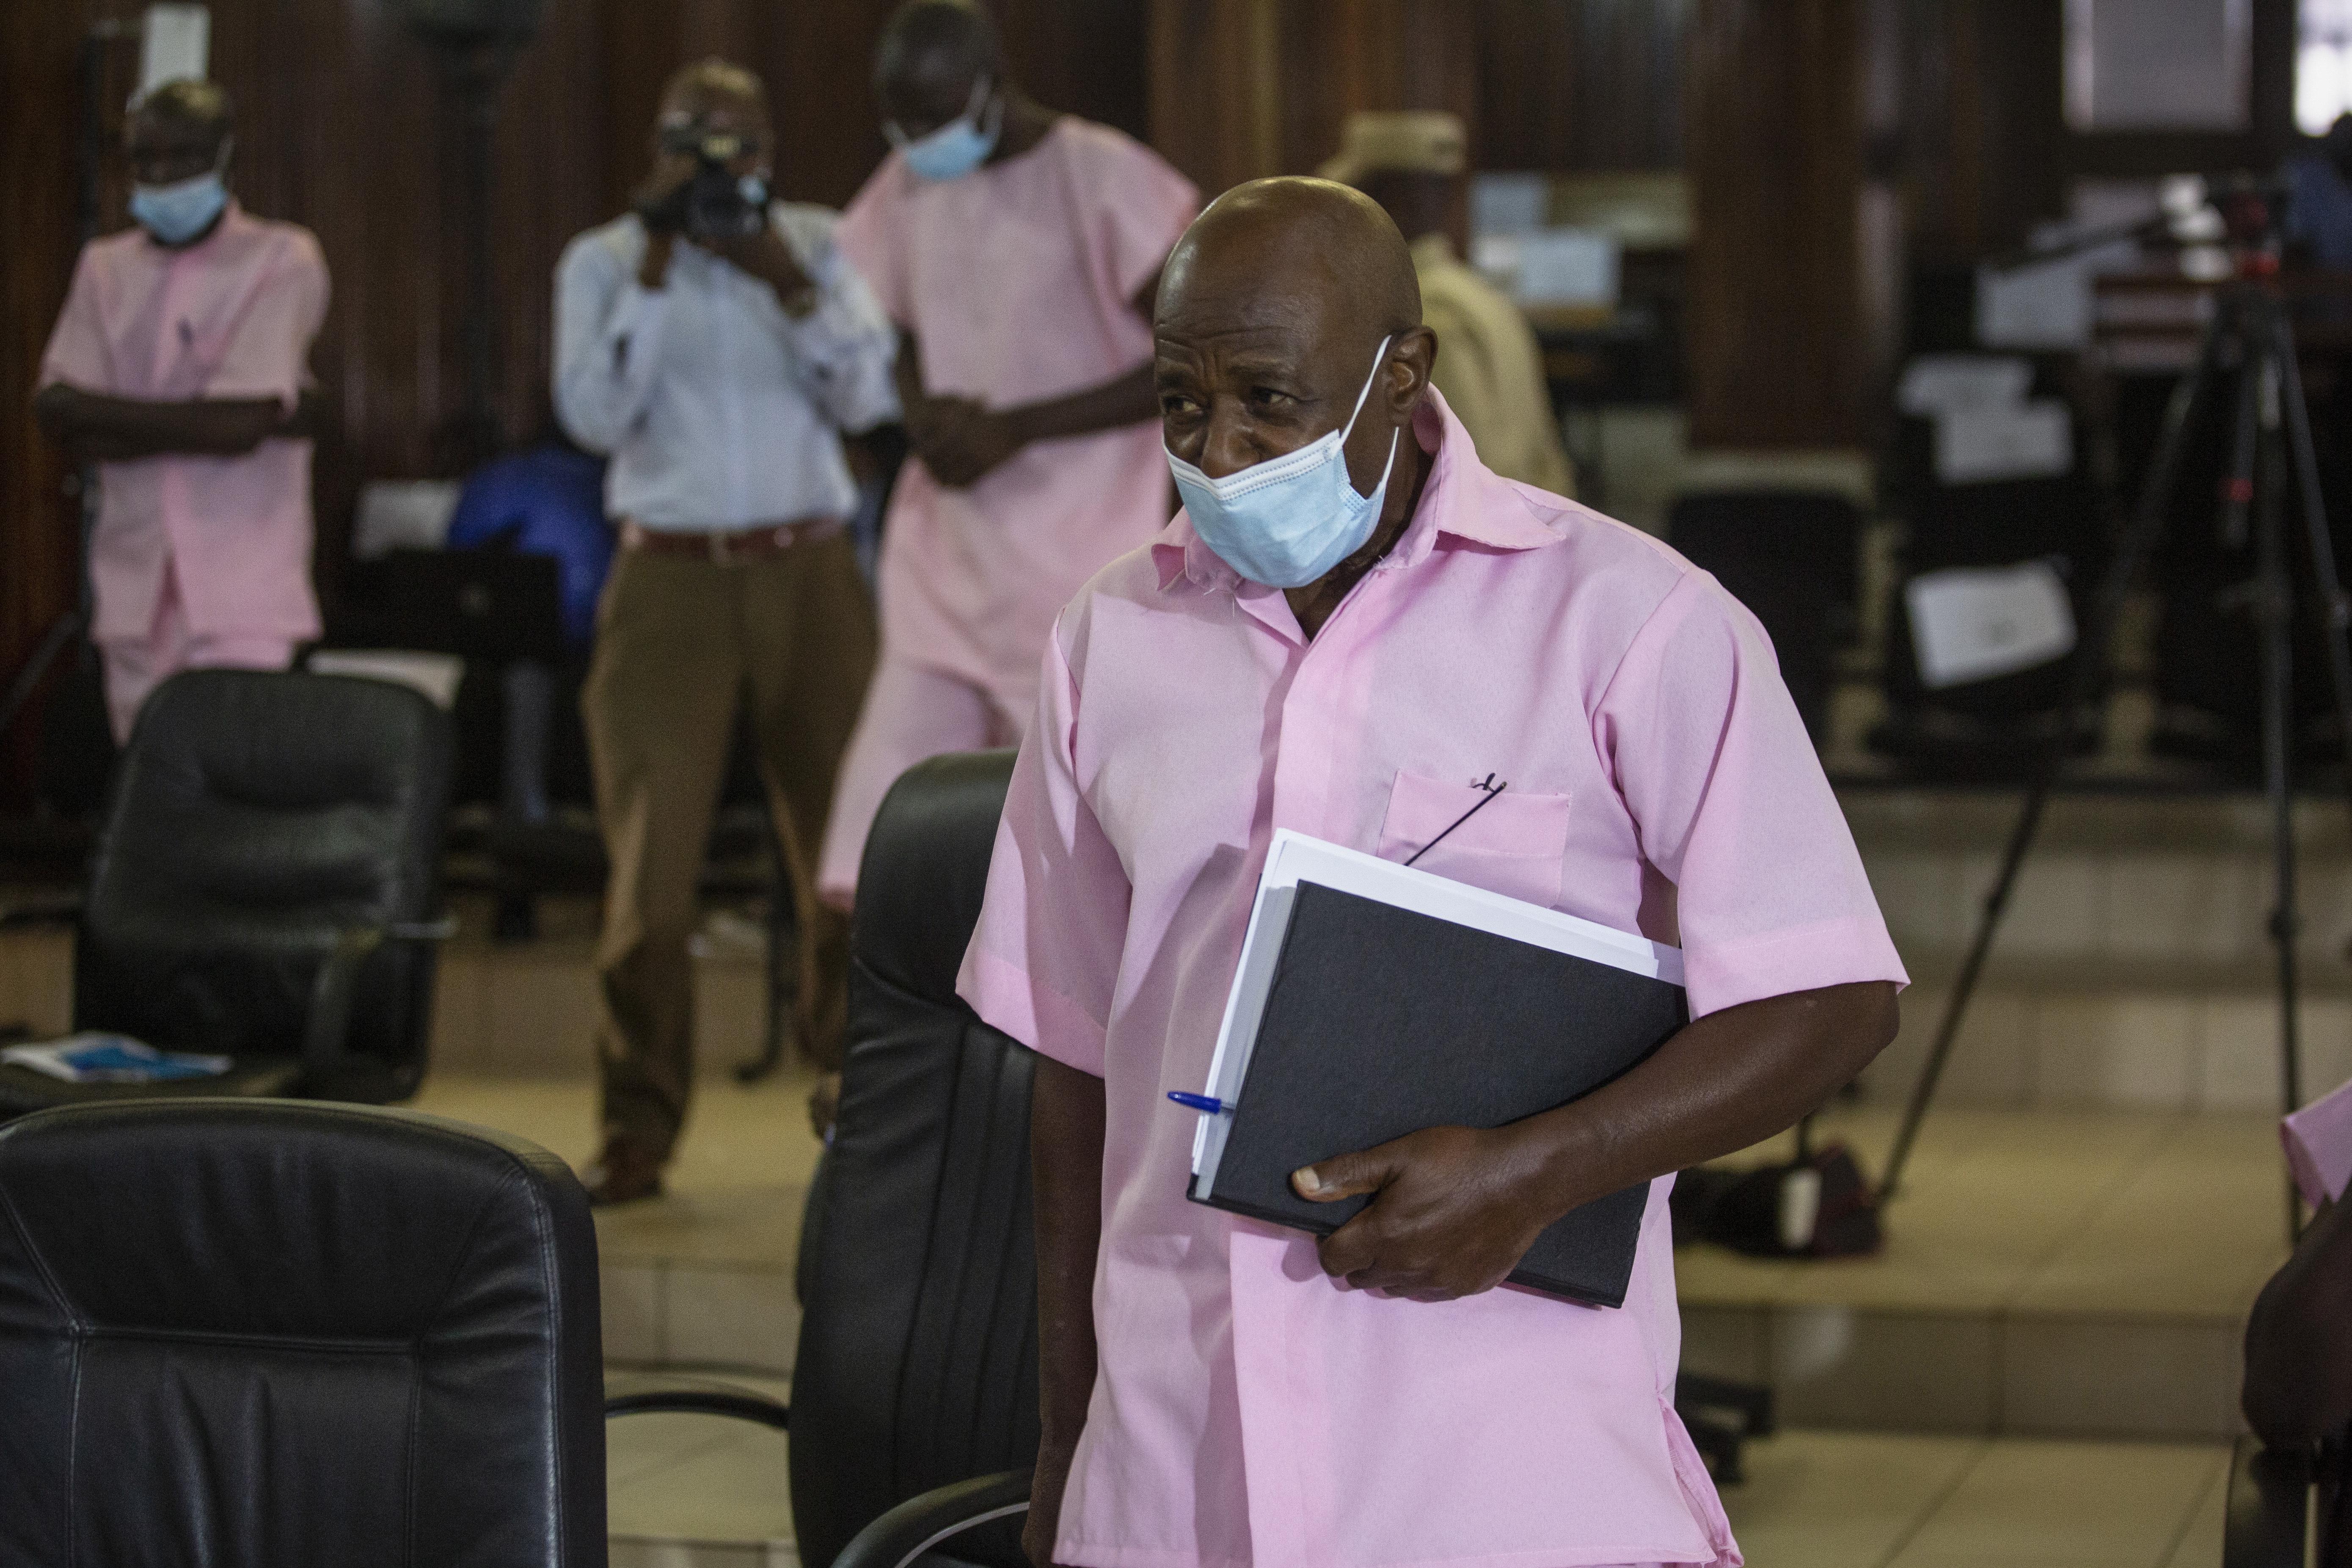 Paul Rusesabagina attends a court hearing in Kigali, Rwanda.